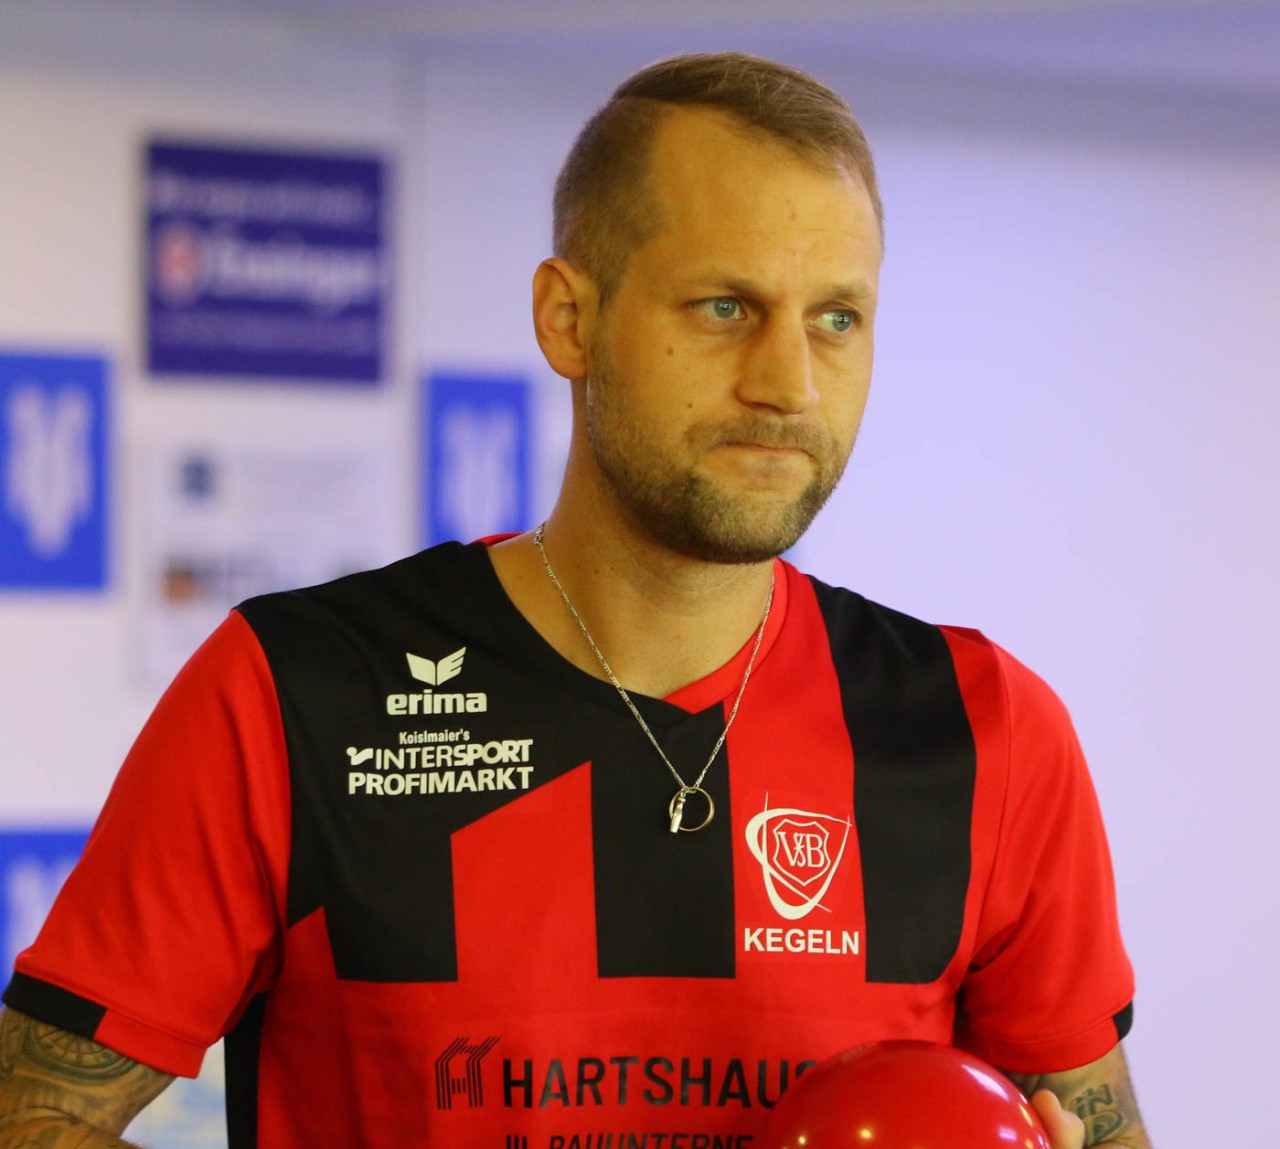 Kegeln: Hallbergmoos klettert dank Sieg in Unterharmersbach auf Rang 2 in der 2. Bundesliga